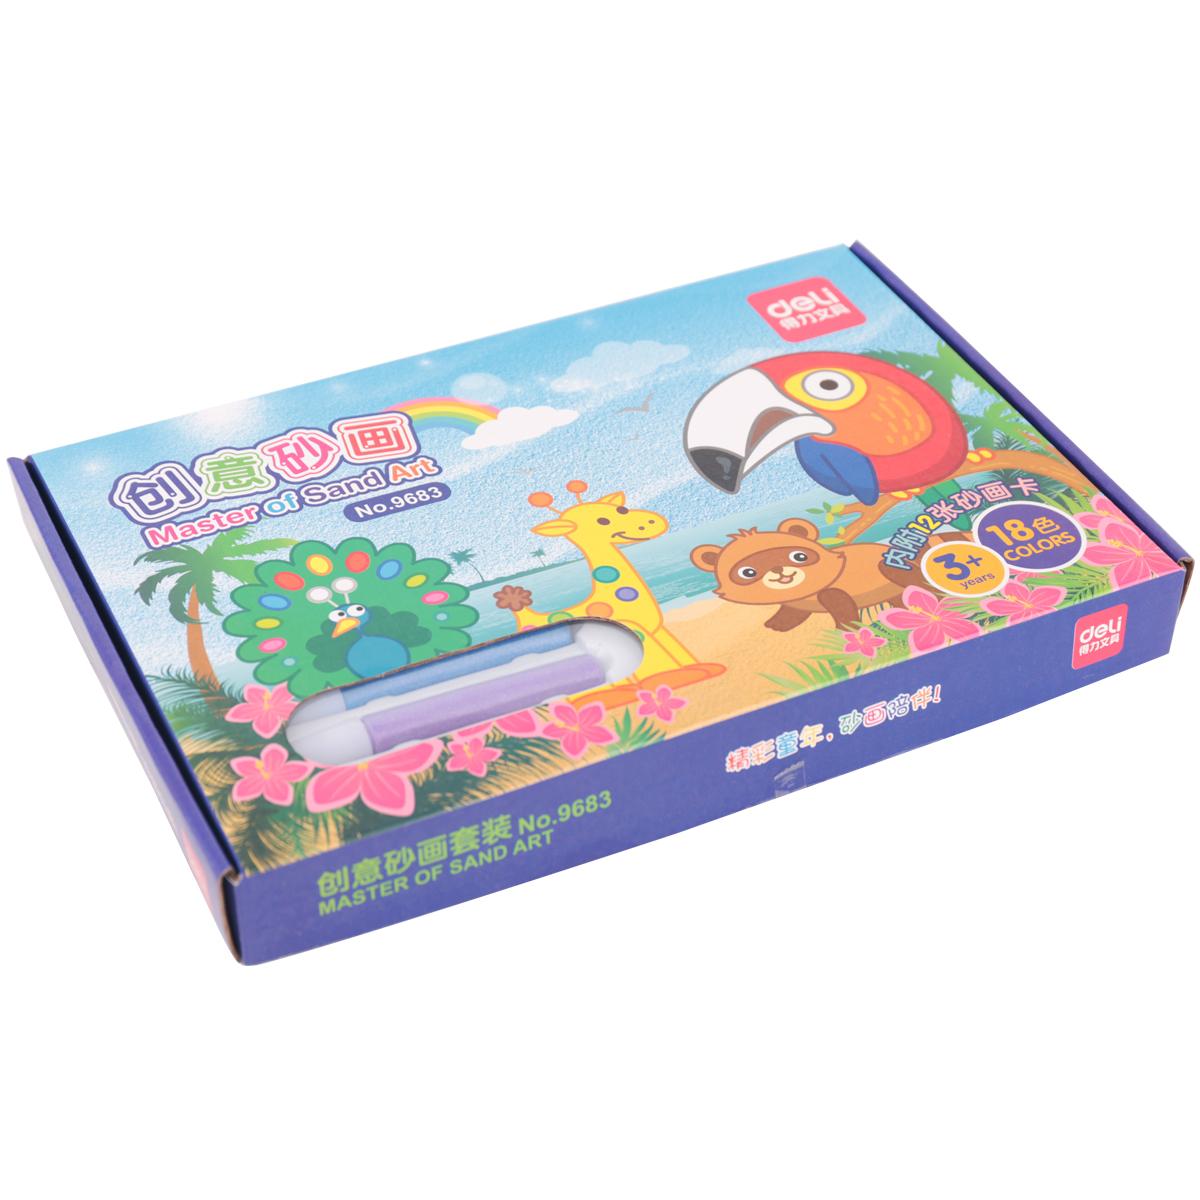 得力(deli)9683砂画套装18色/盒(单位:盒)混